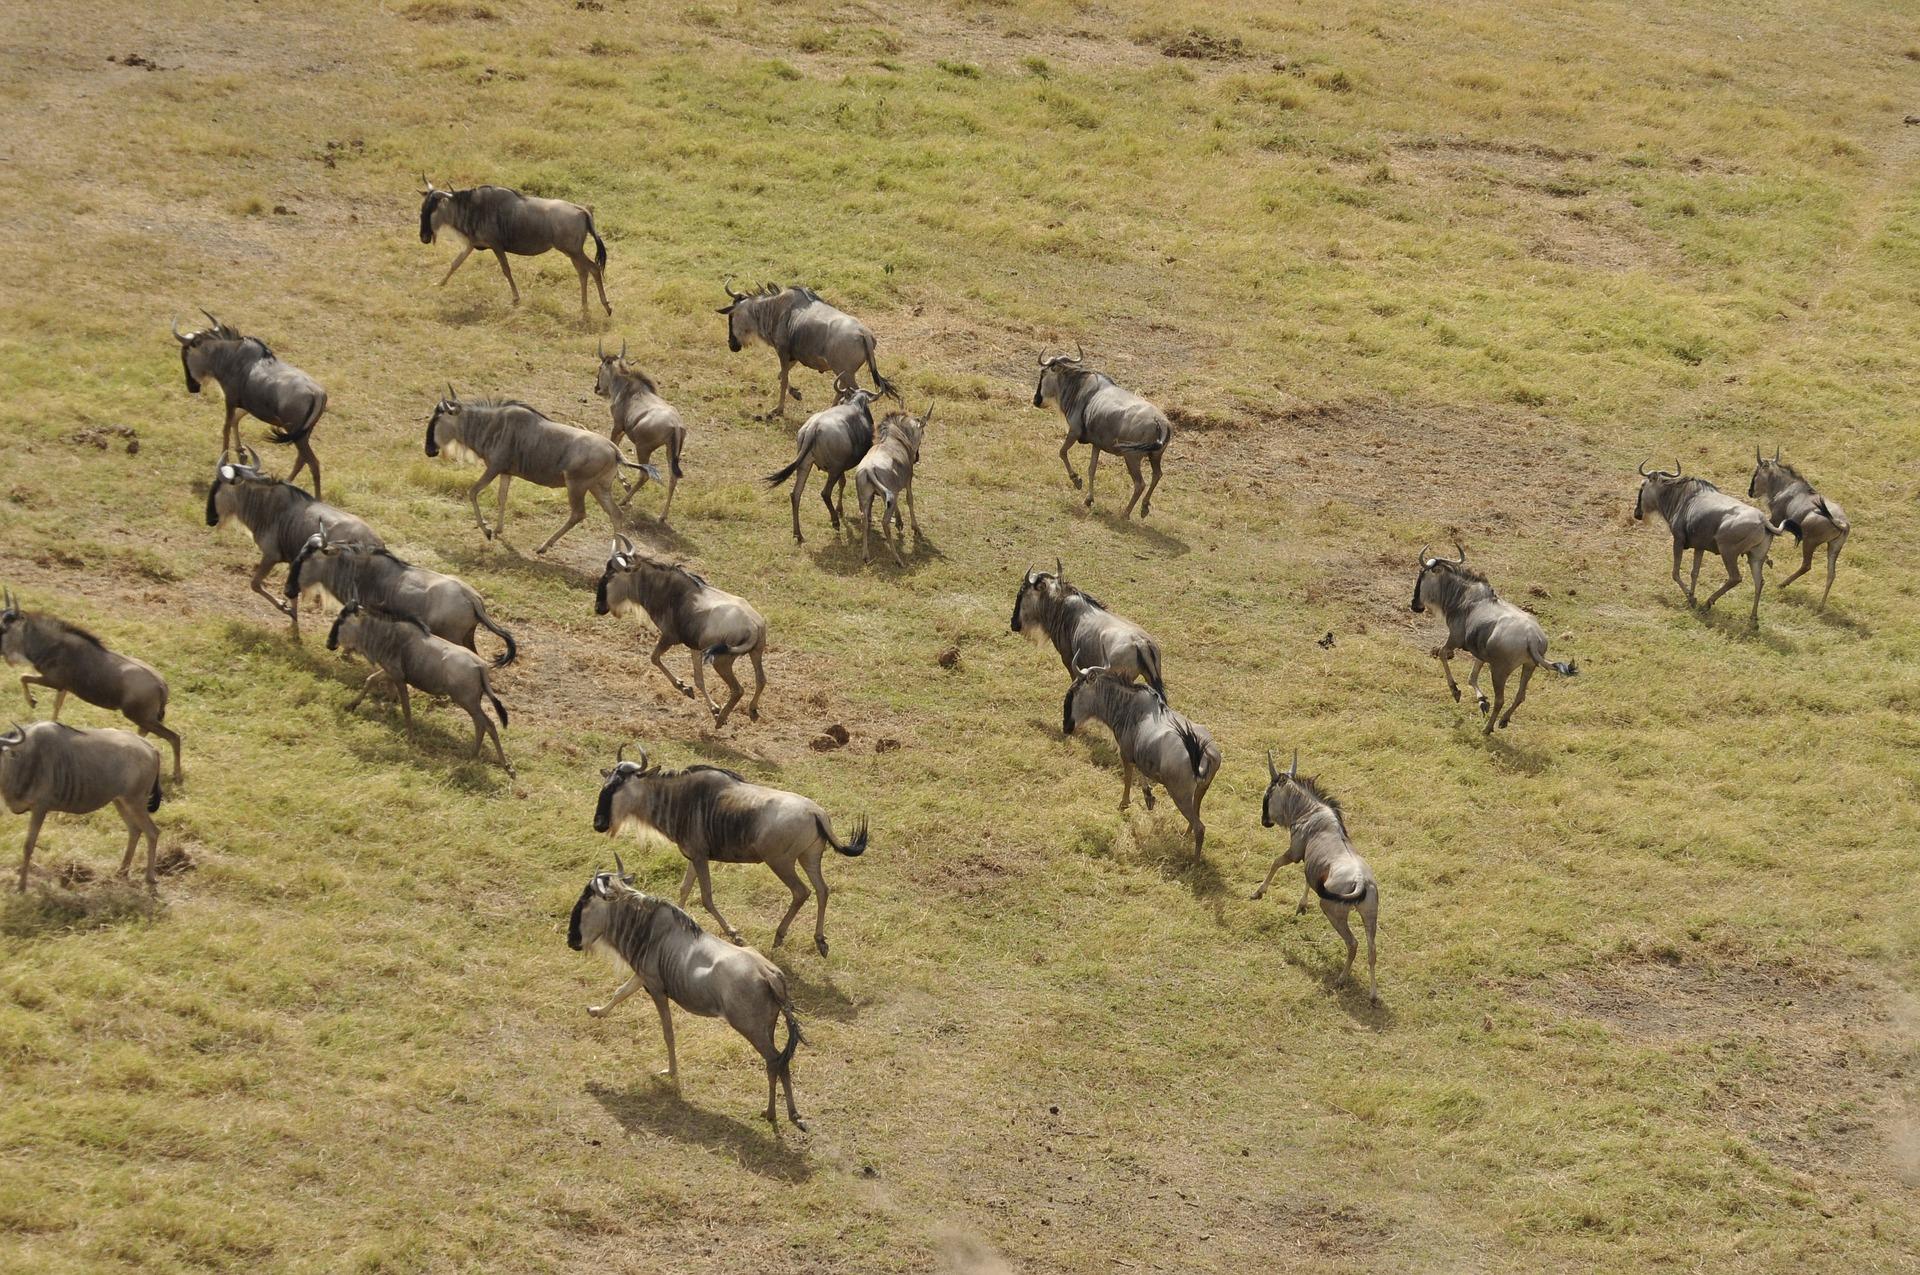 Kenya-Masai Mara National Reserve